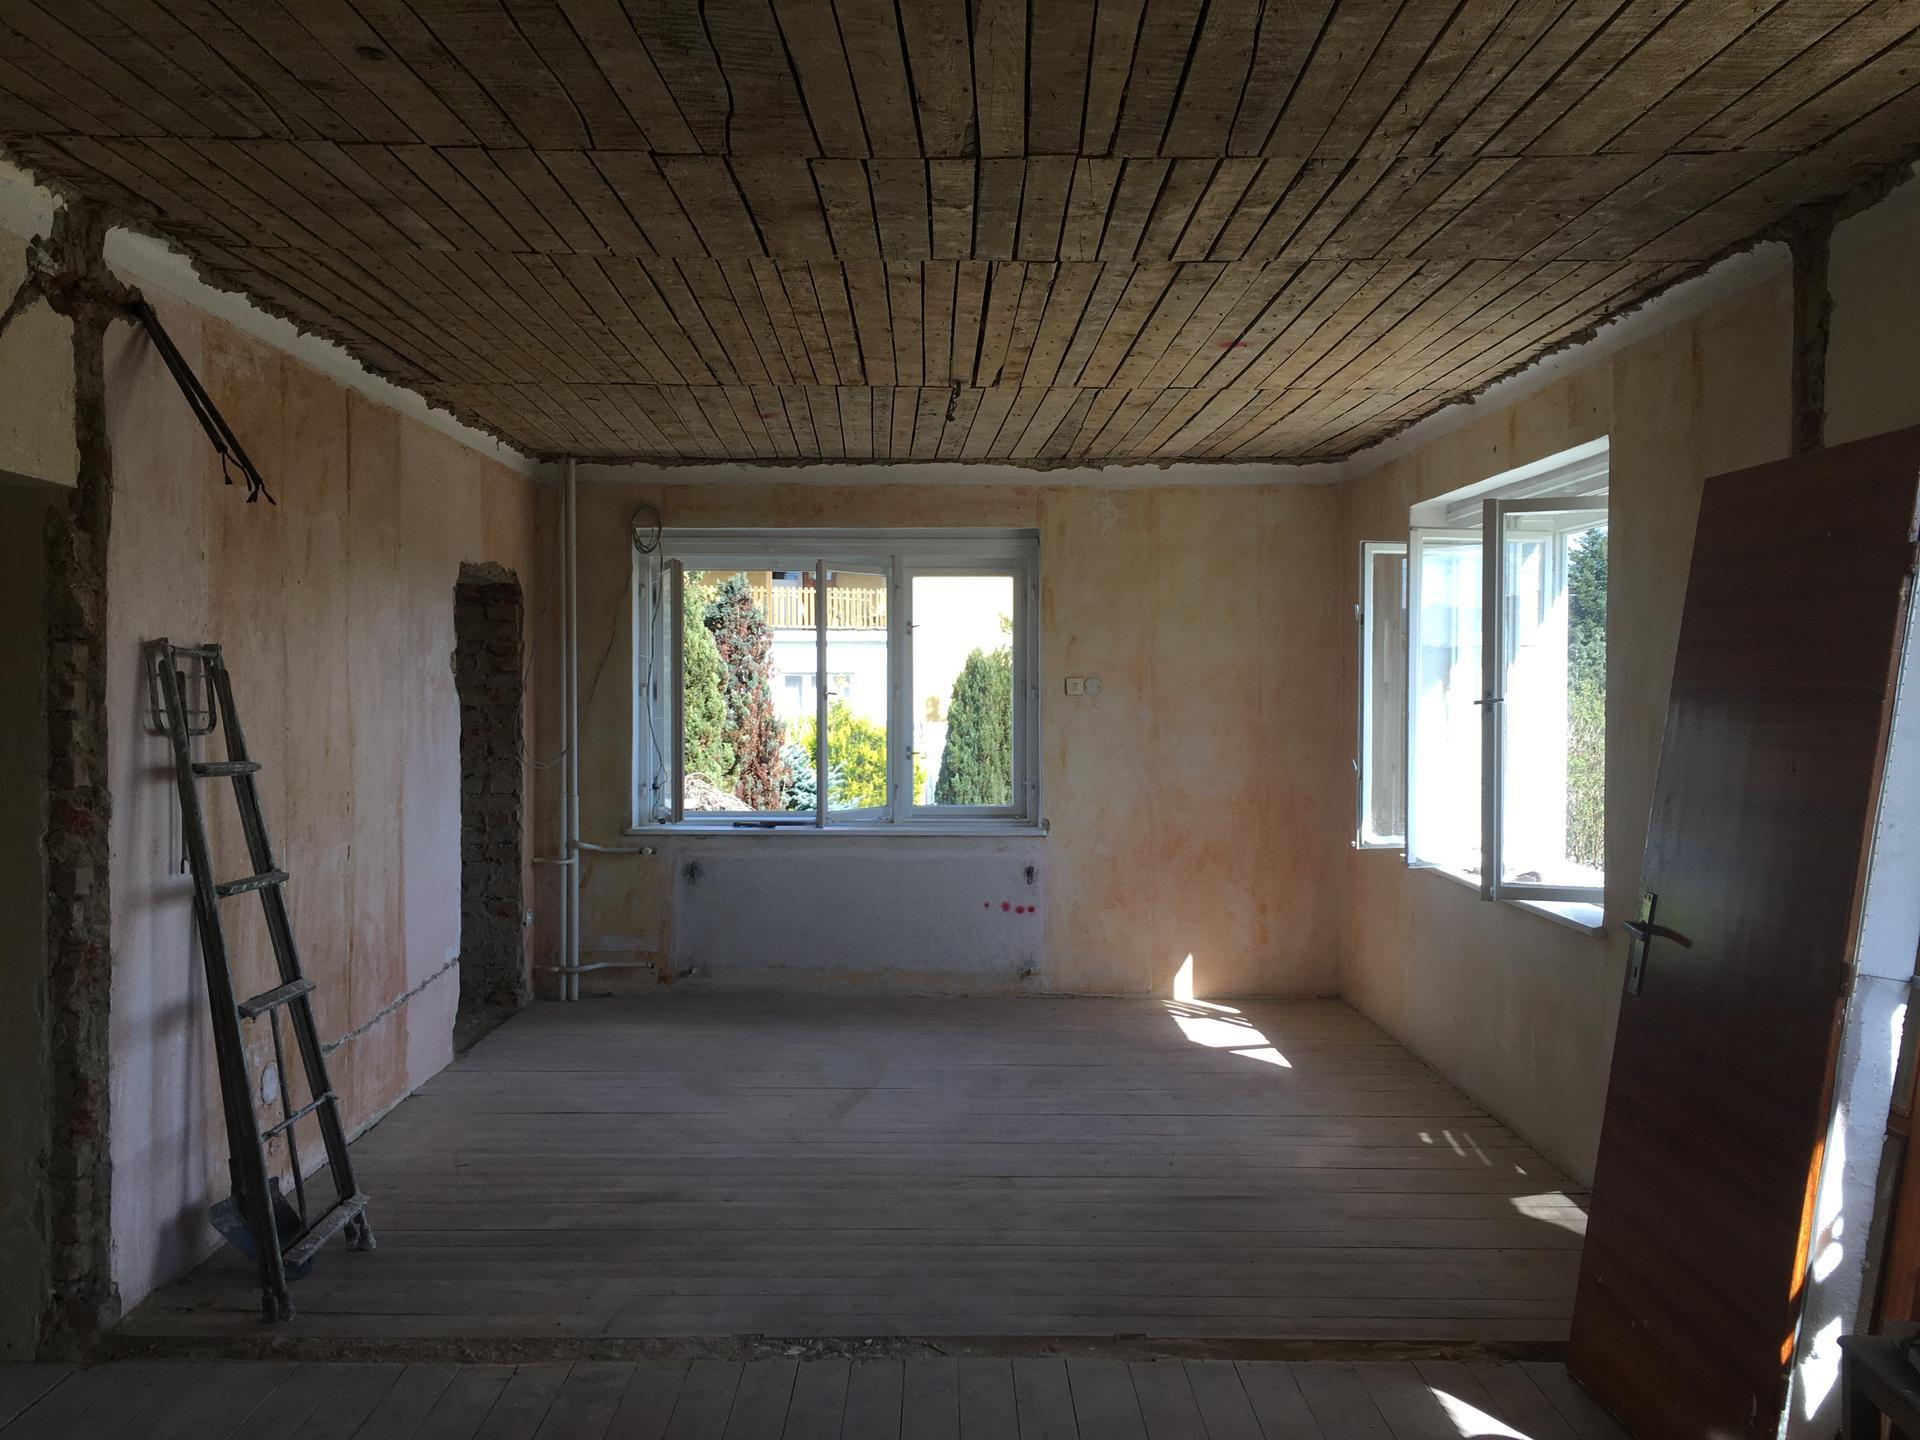 Rekonstrukce 🏡 20/21 - Shoz rákosu ze stropů